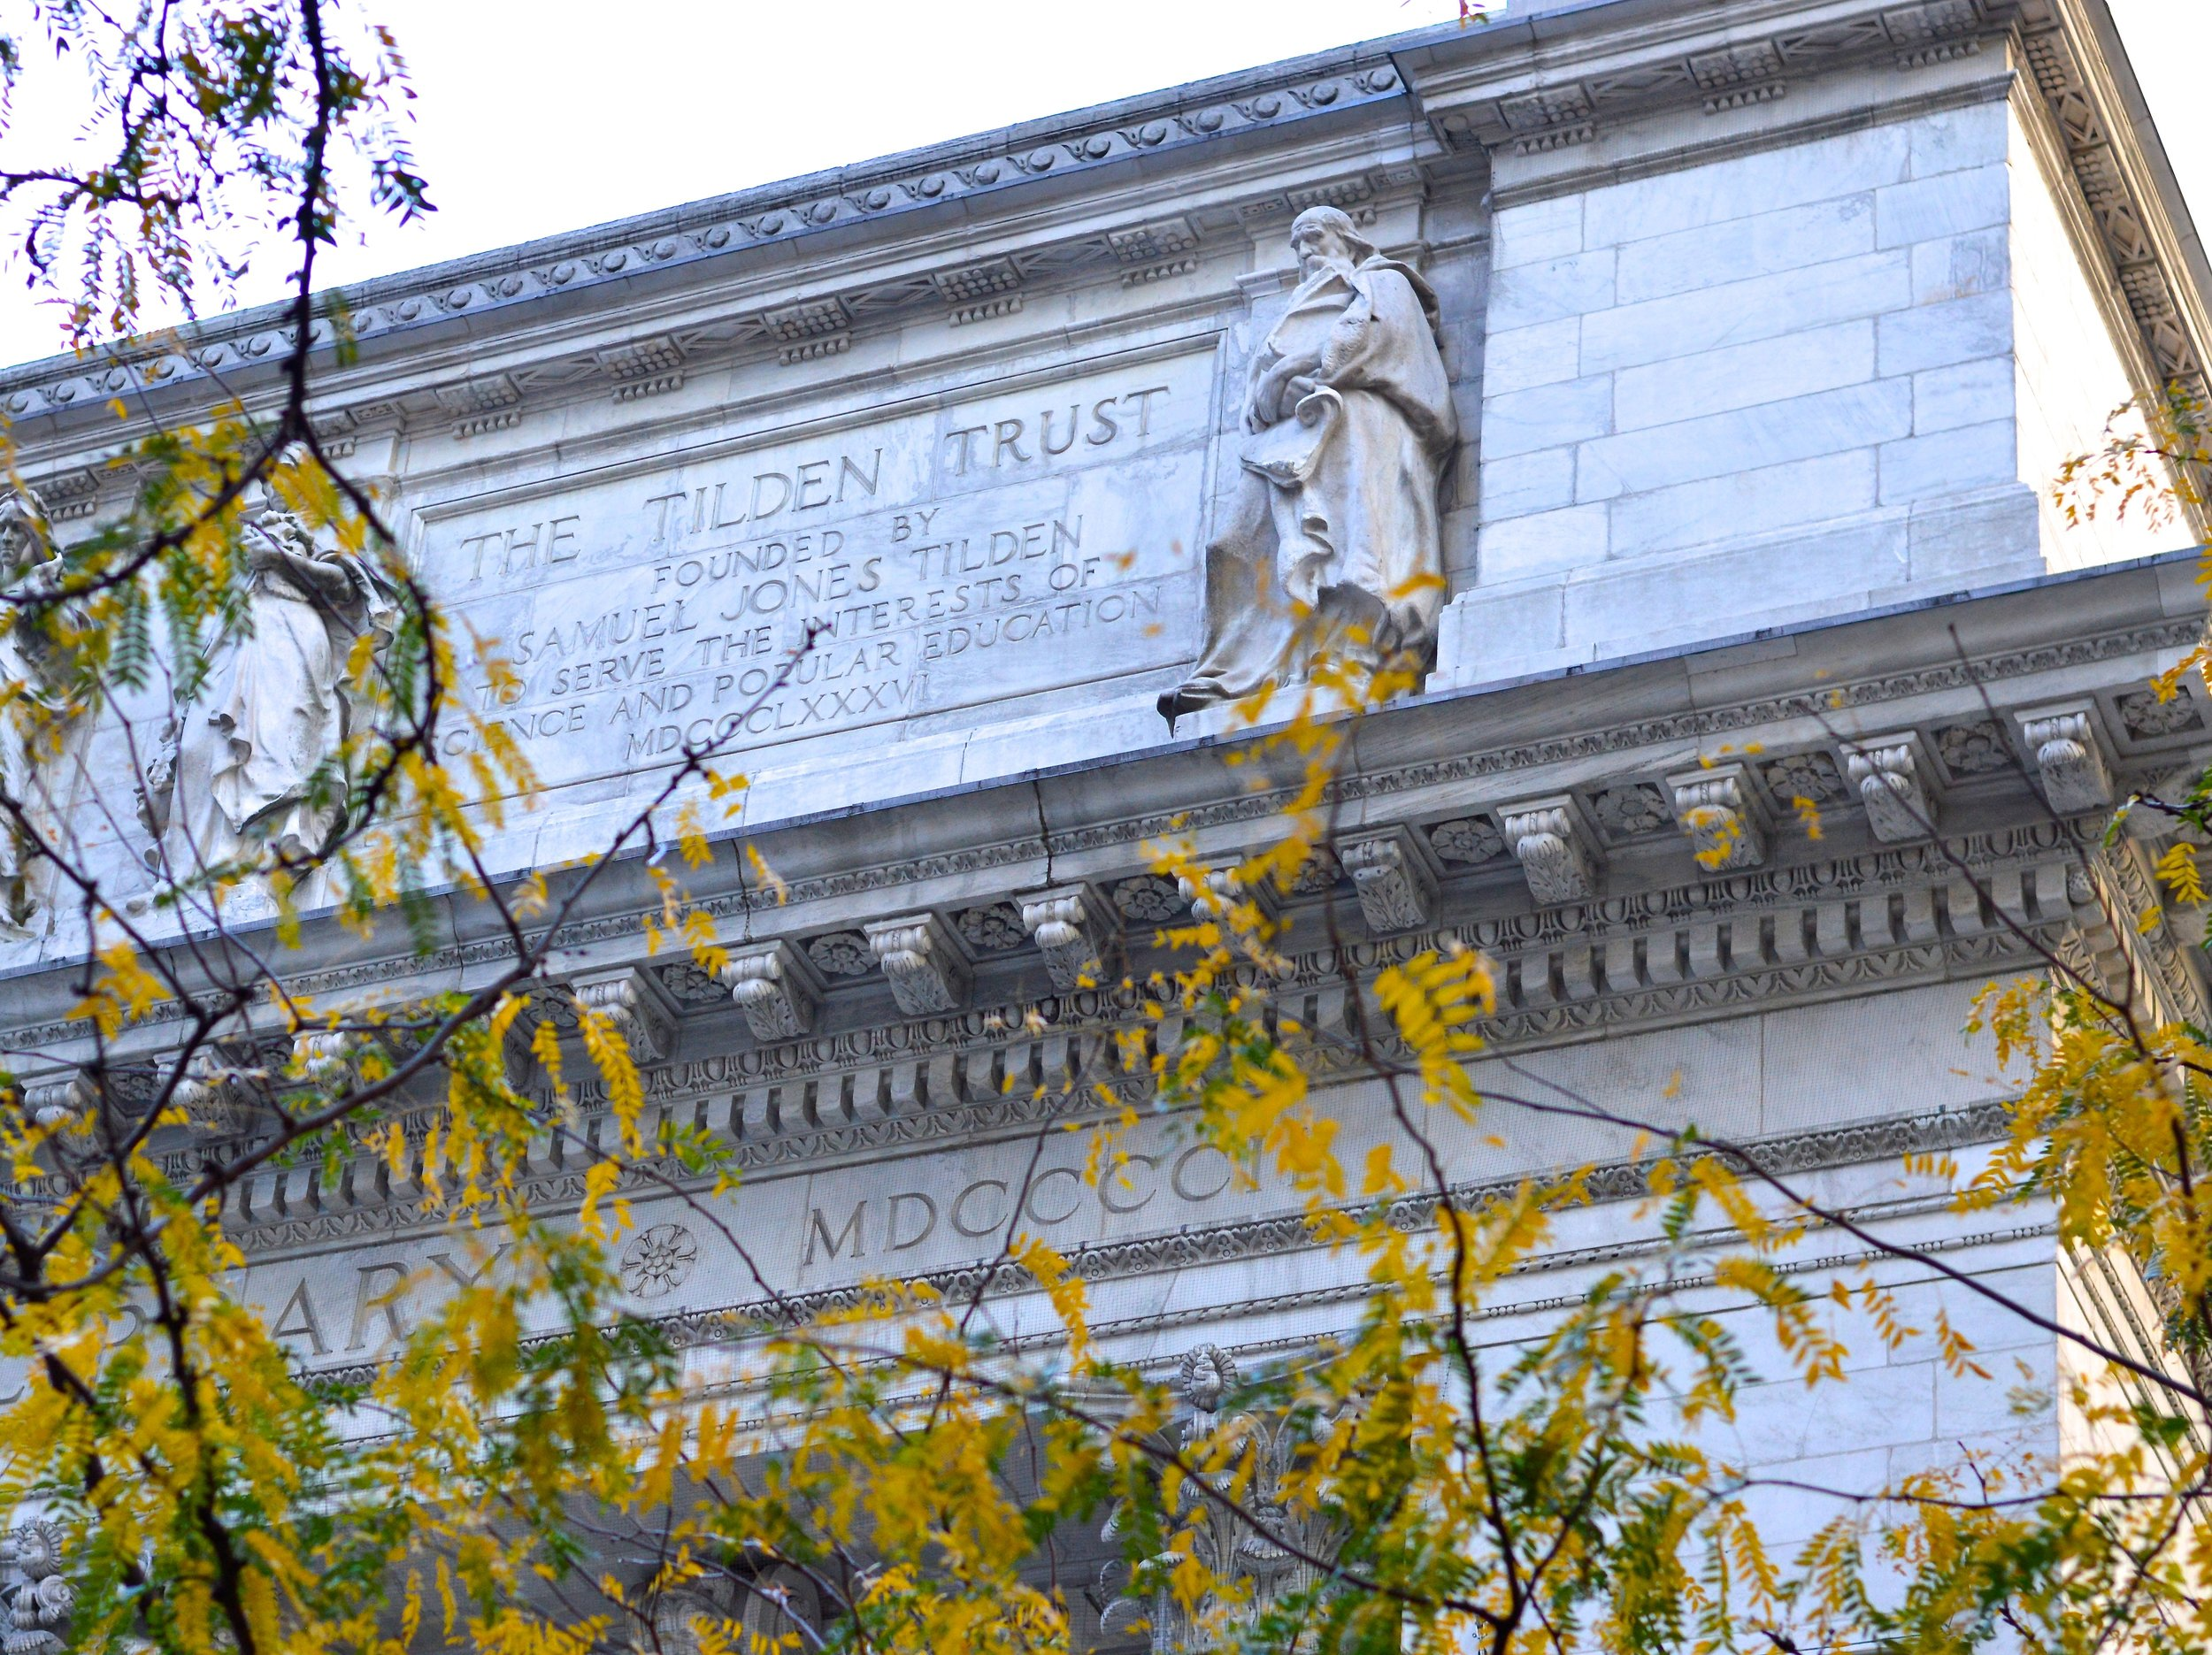 Bryant Park New York Public Library 8.jpg